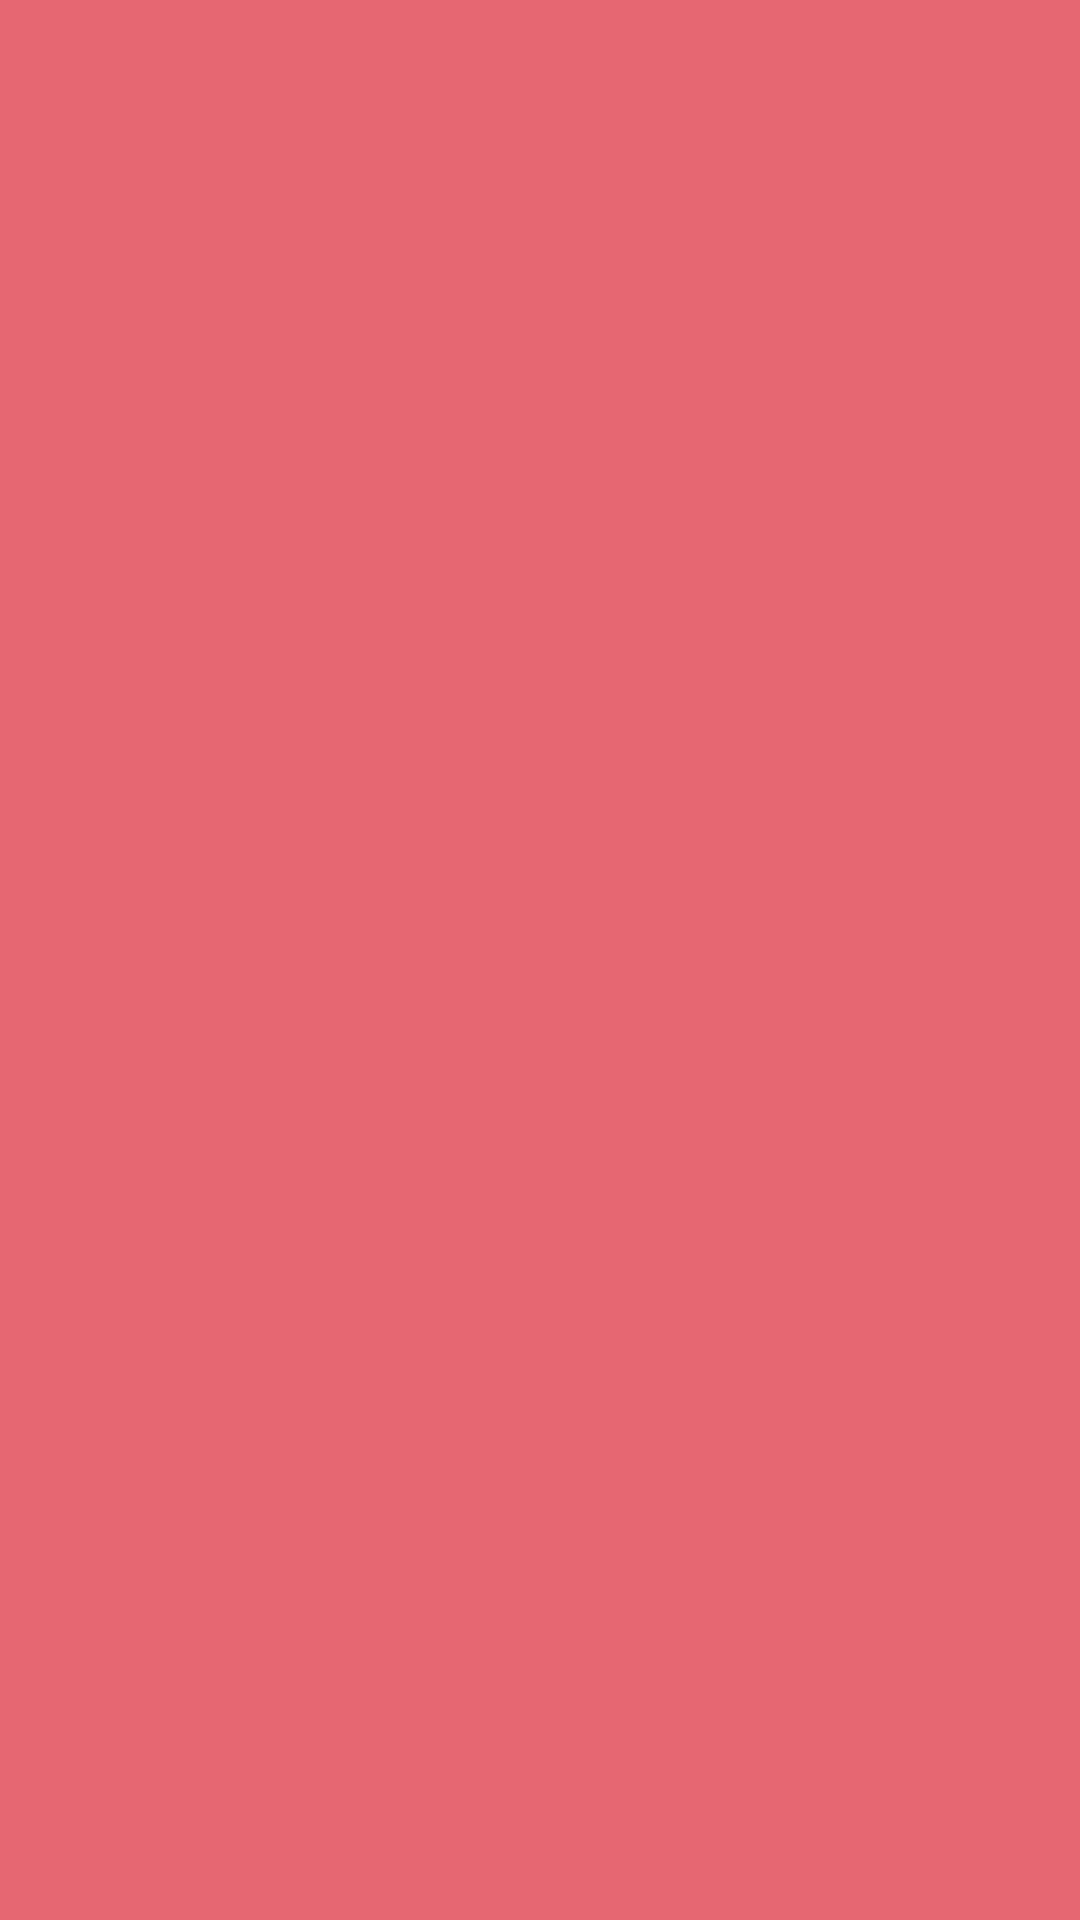 1080x1920 Light Carmine Pink Solid Color Background